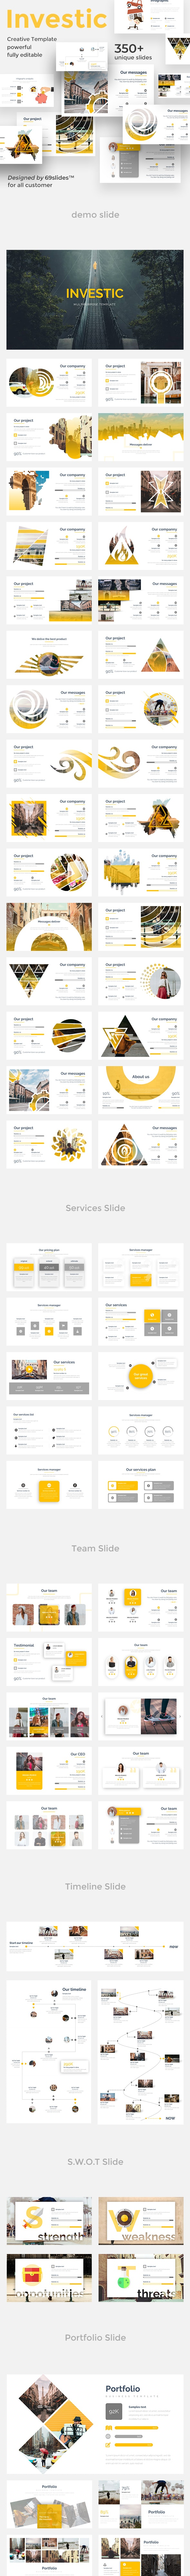 Investic Pitch Deck Google Slide Template - Google Slides Presentation Templates